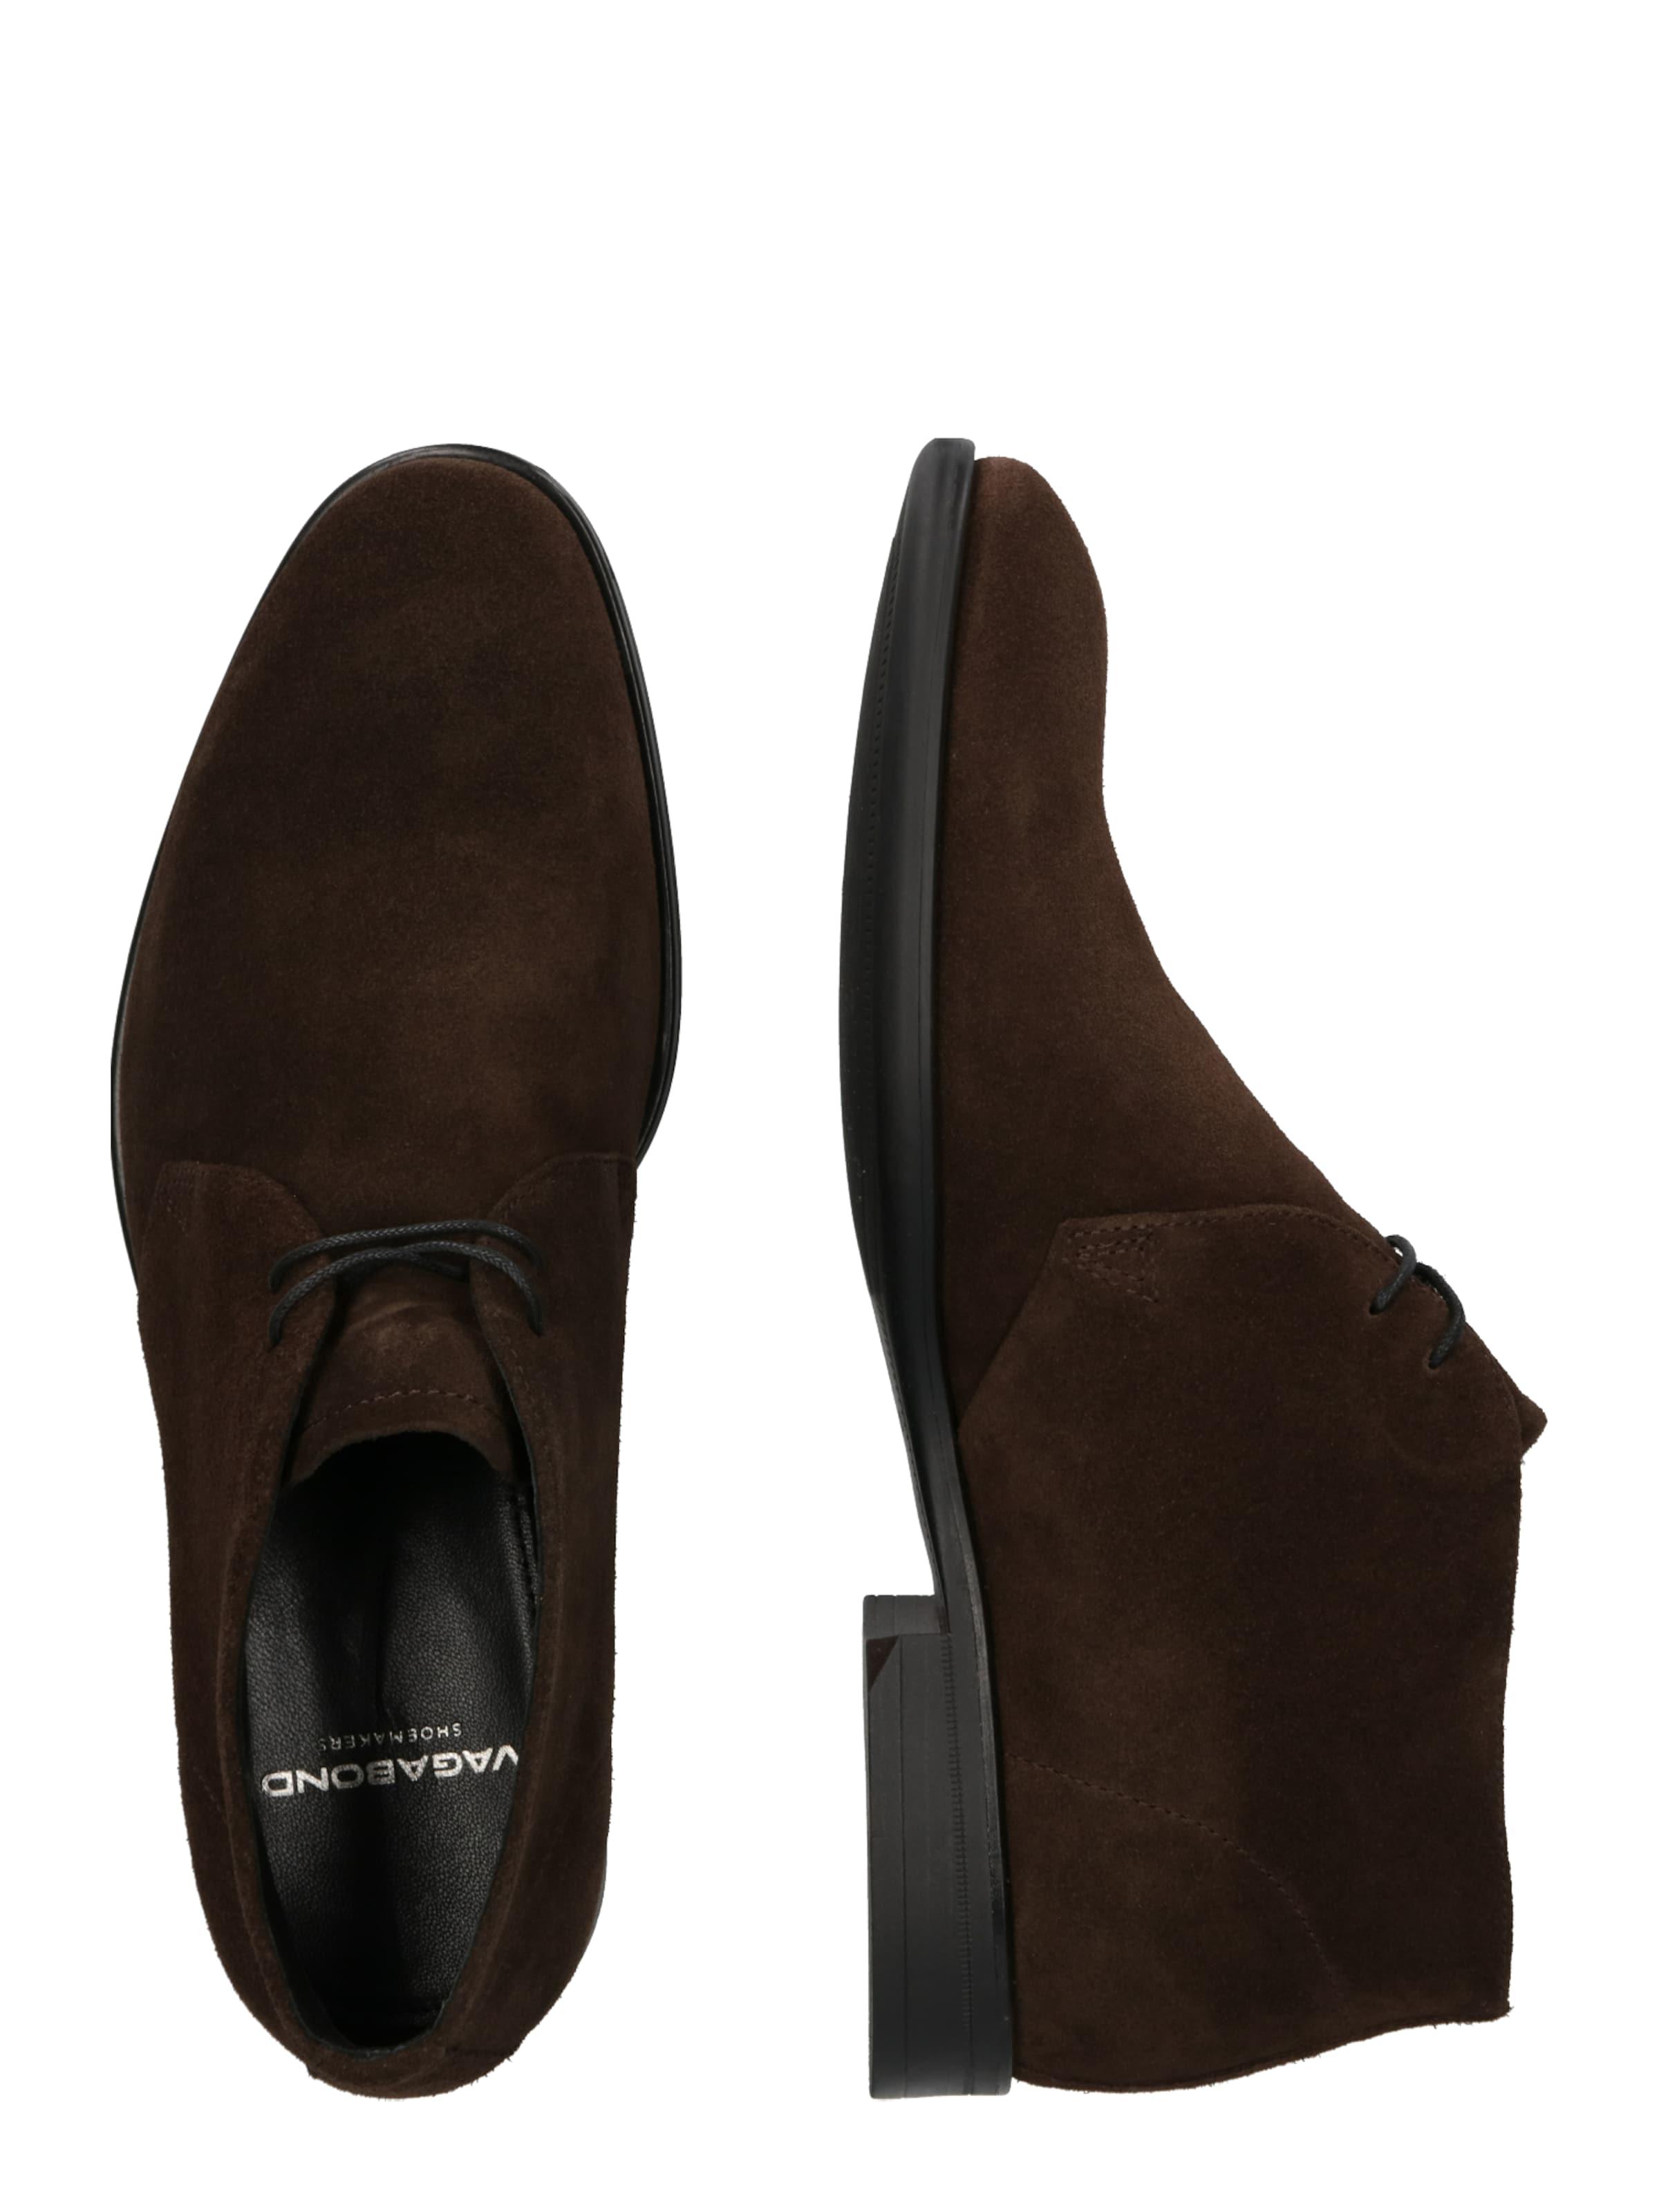 'harvey' Vagabond Dunkelbraun Schnürschuh Shoemakers In 3A54jRL